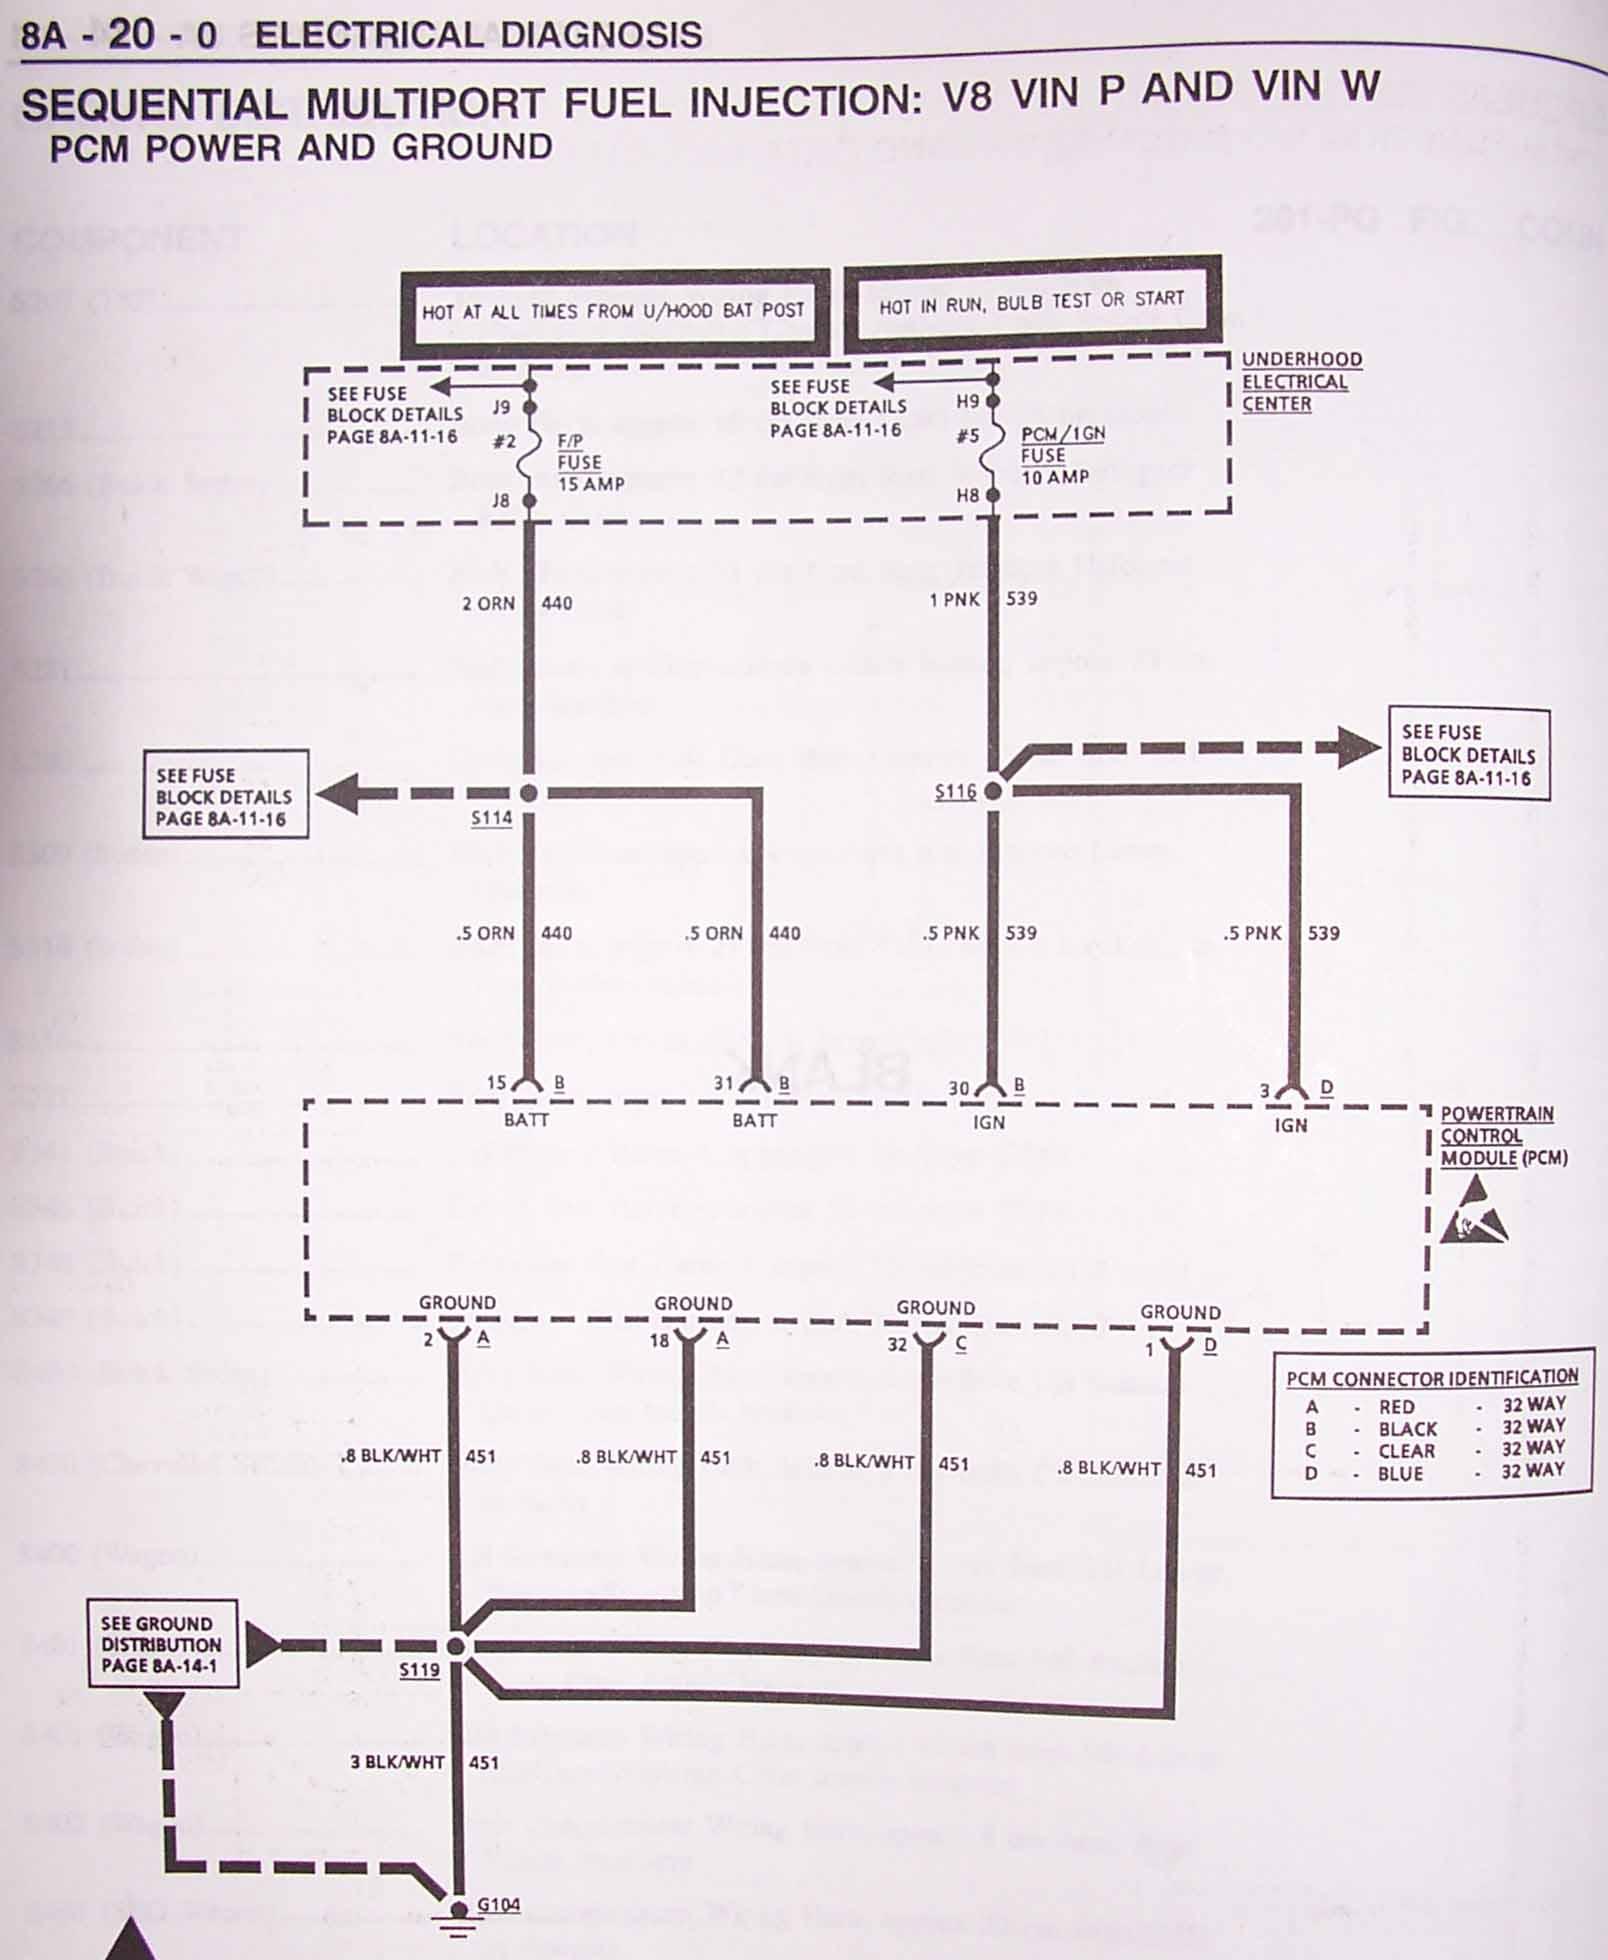 1995 Impala Ss  Caprice  Roadmaster Wire Harness Info